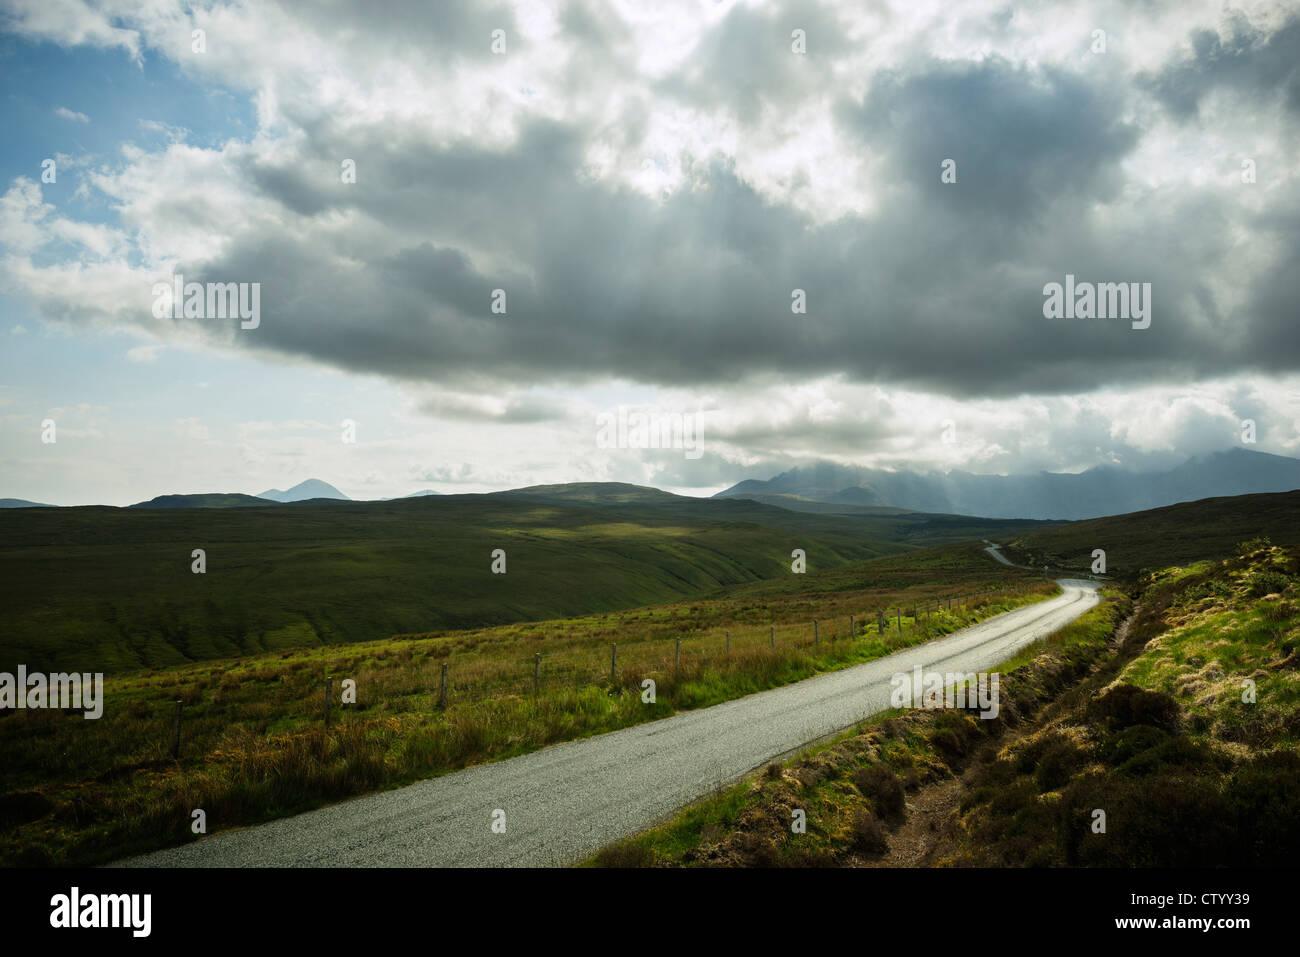 Gravel road in rural landscape - Stock Image